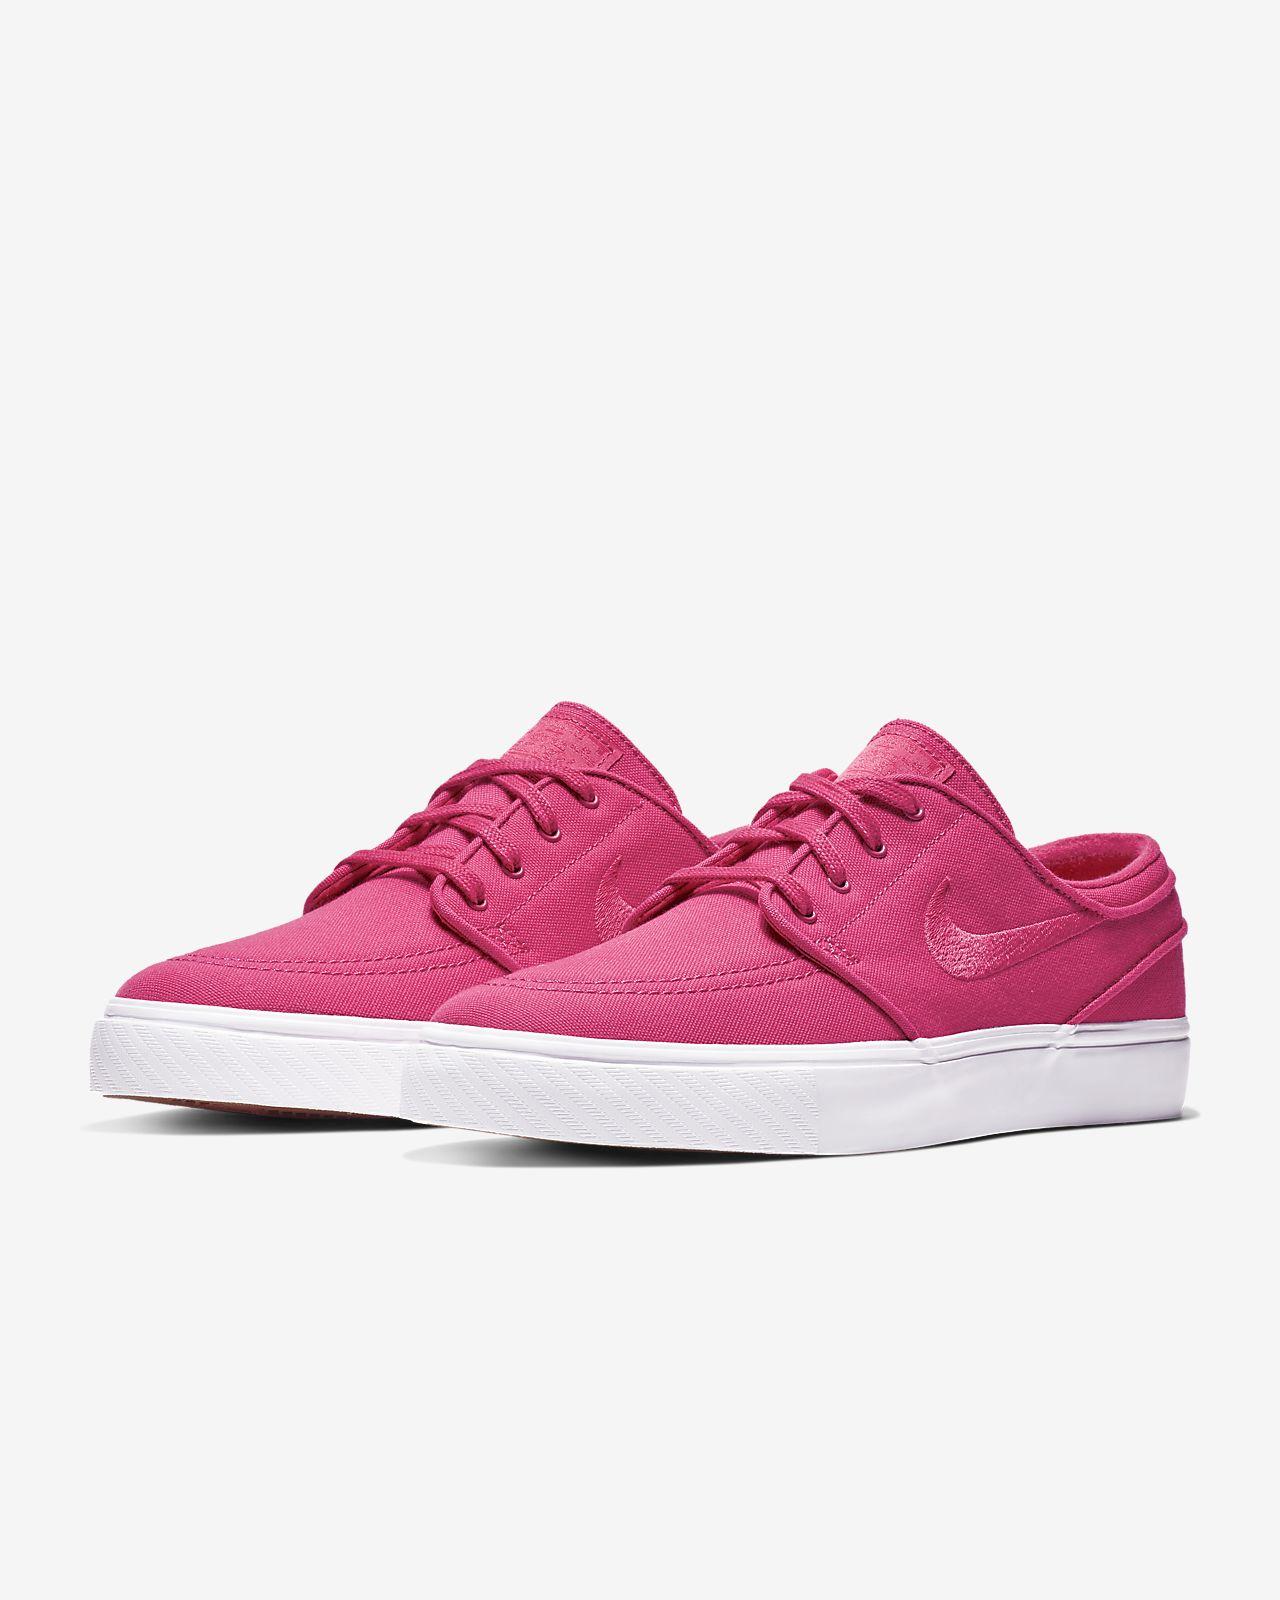 buy online 7abe1 fbd43 ... Nike SB Zoom Stefan Janoski Canvas Men s Skate Shoe